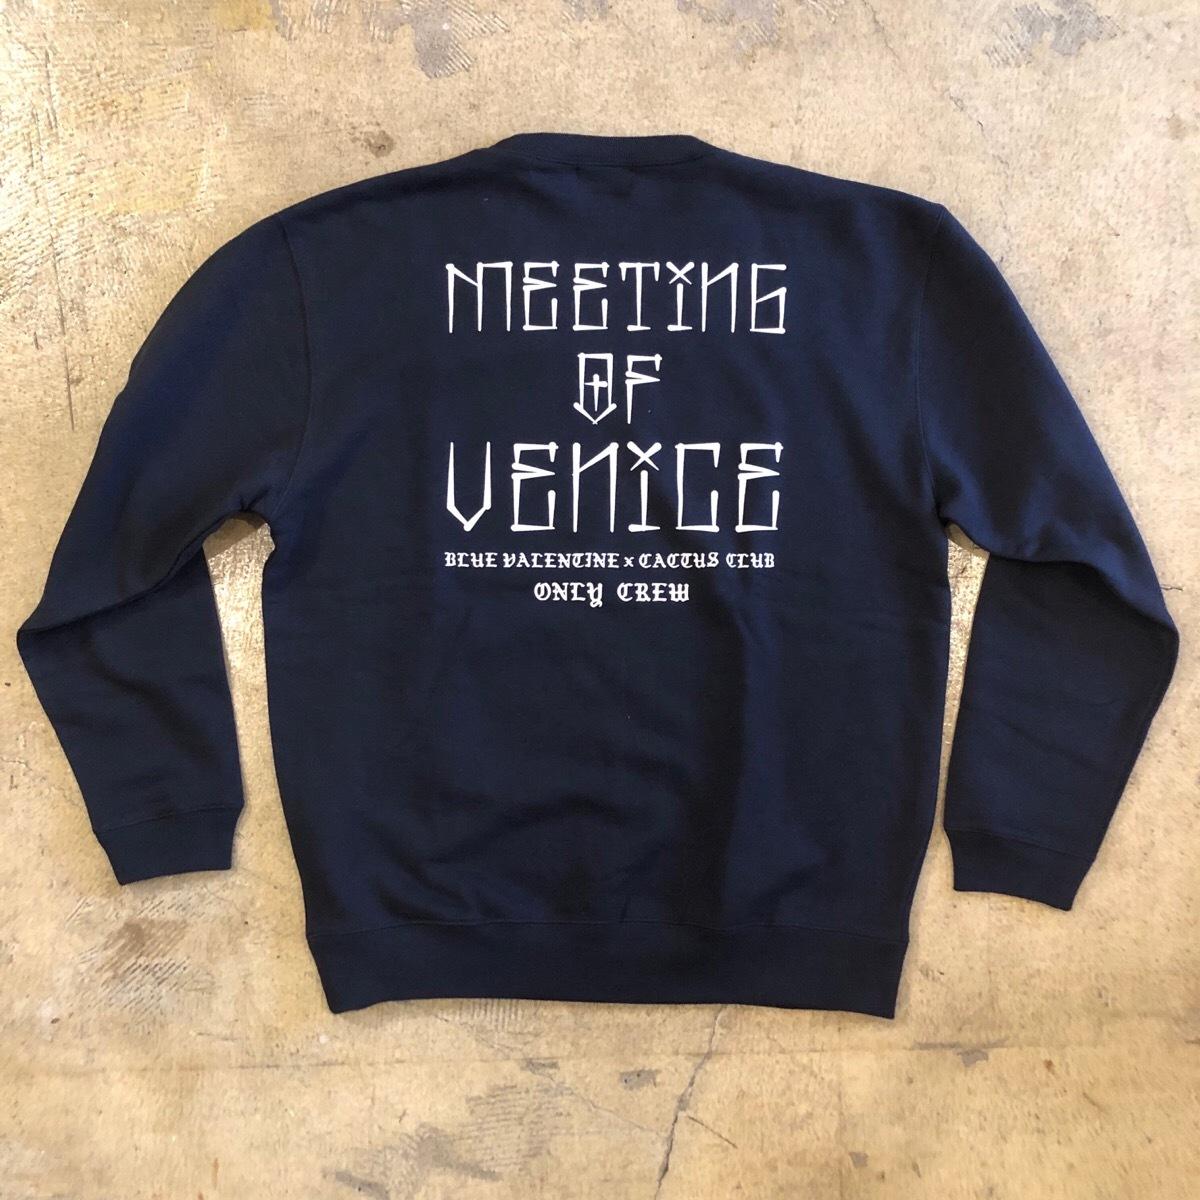 BLUE VALENTINE × CACTUS CLUB #Meeting Of Venice Limited Crew Neck